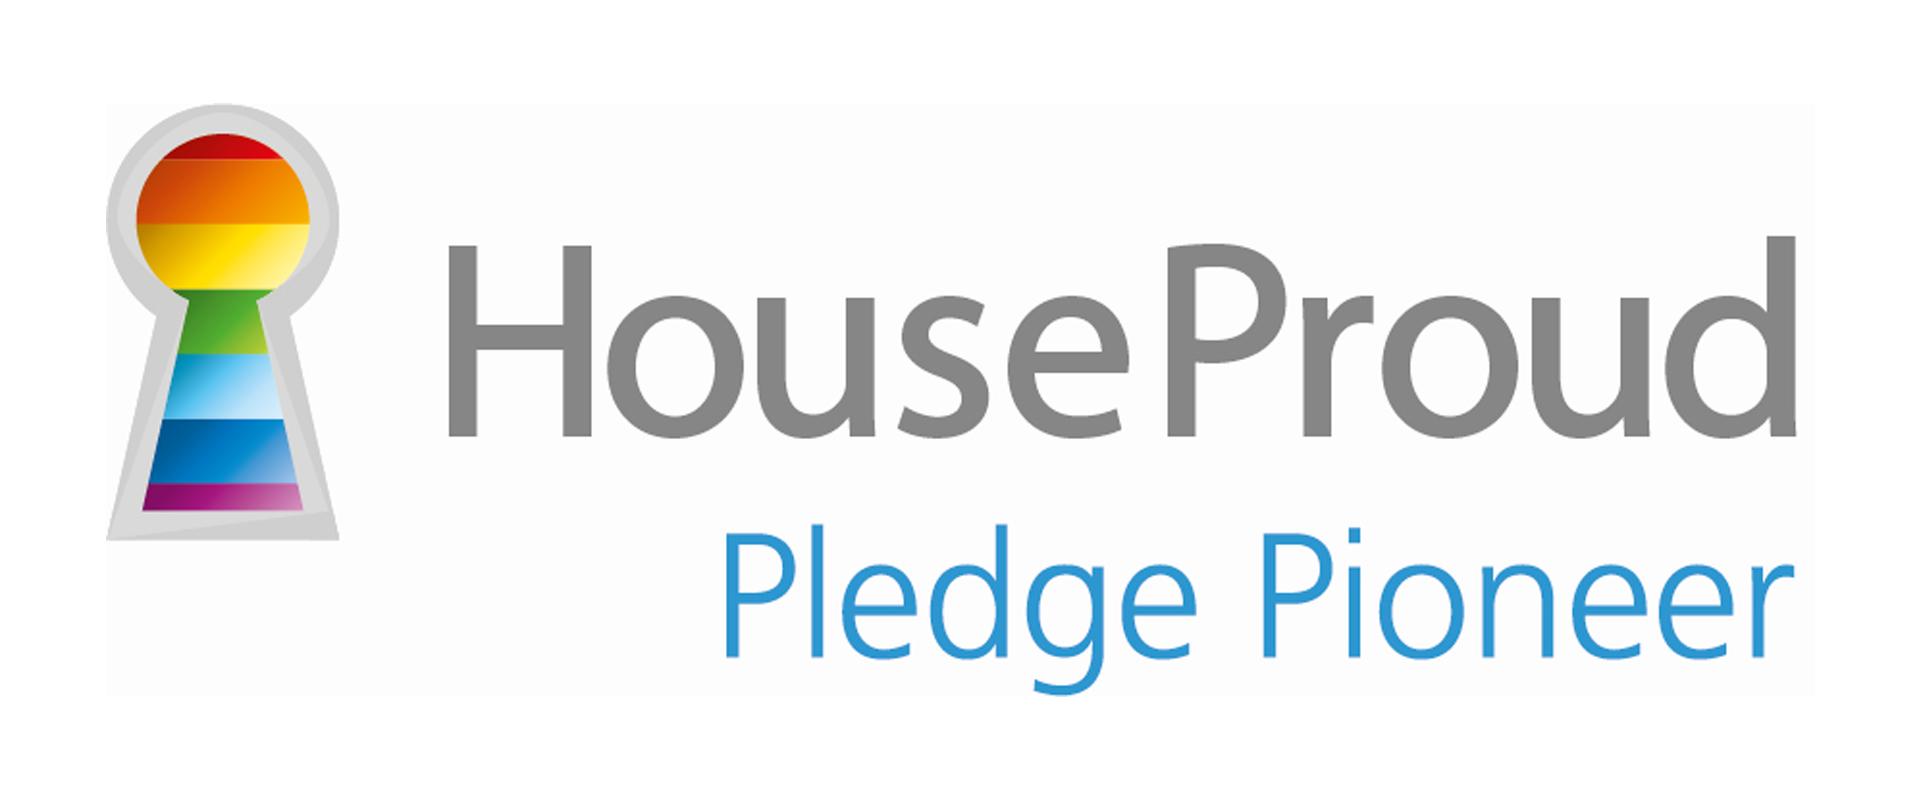 House Proud Pledge Pioneer logo